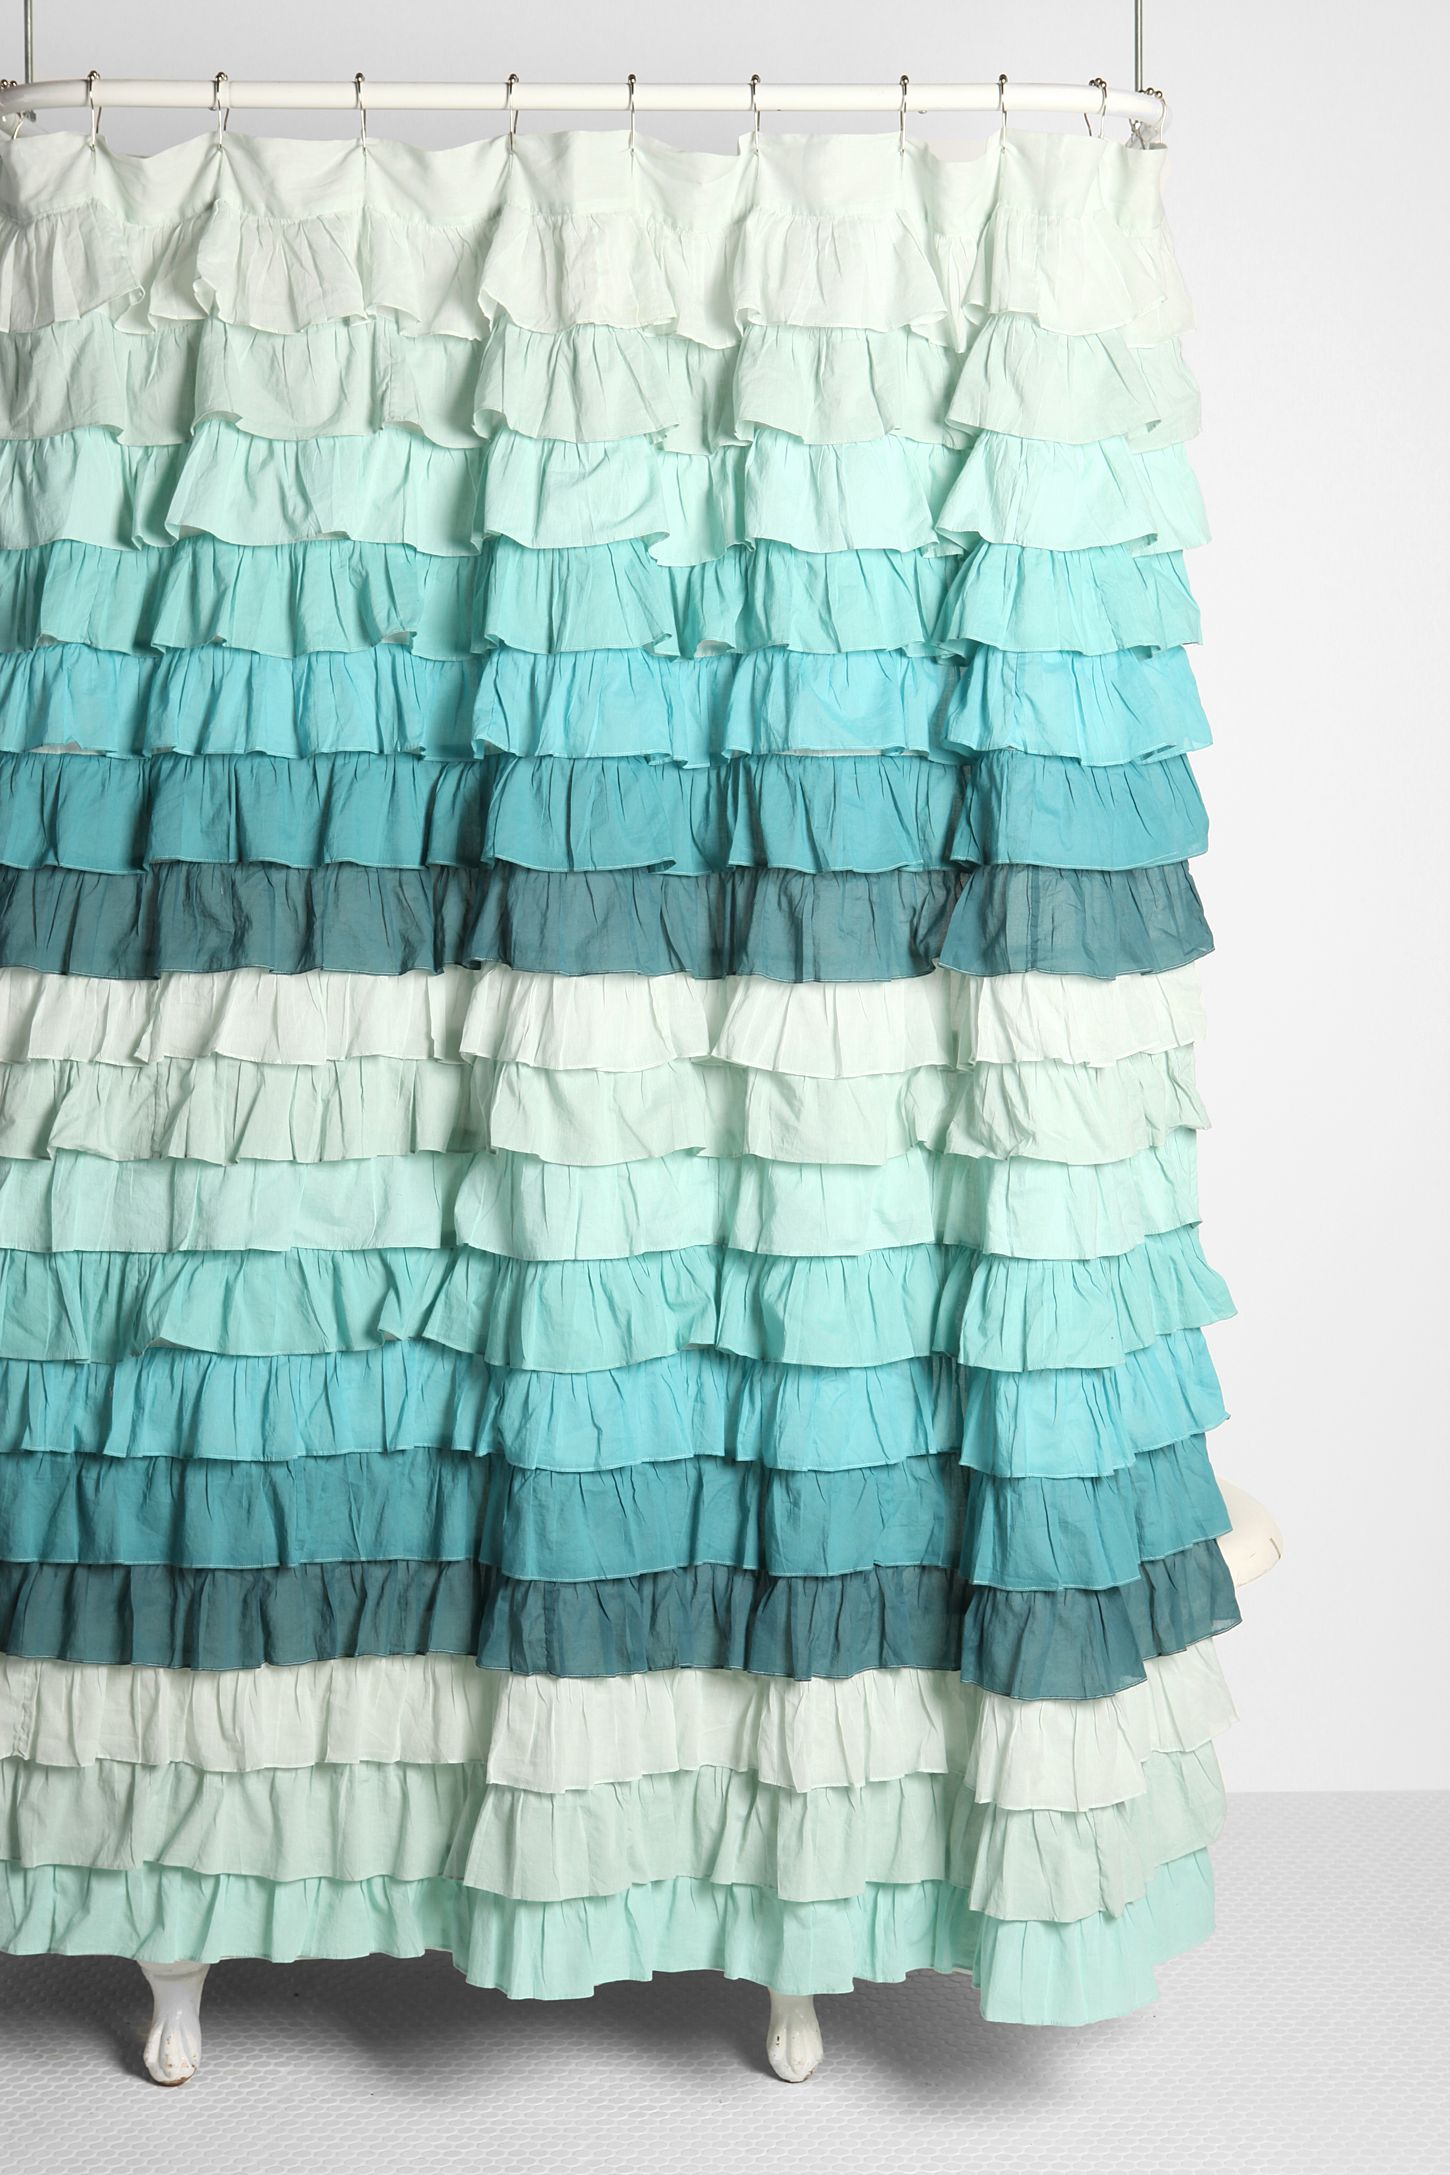 Tonal Wave Ruffle Shower Curtain